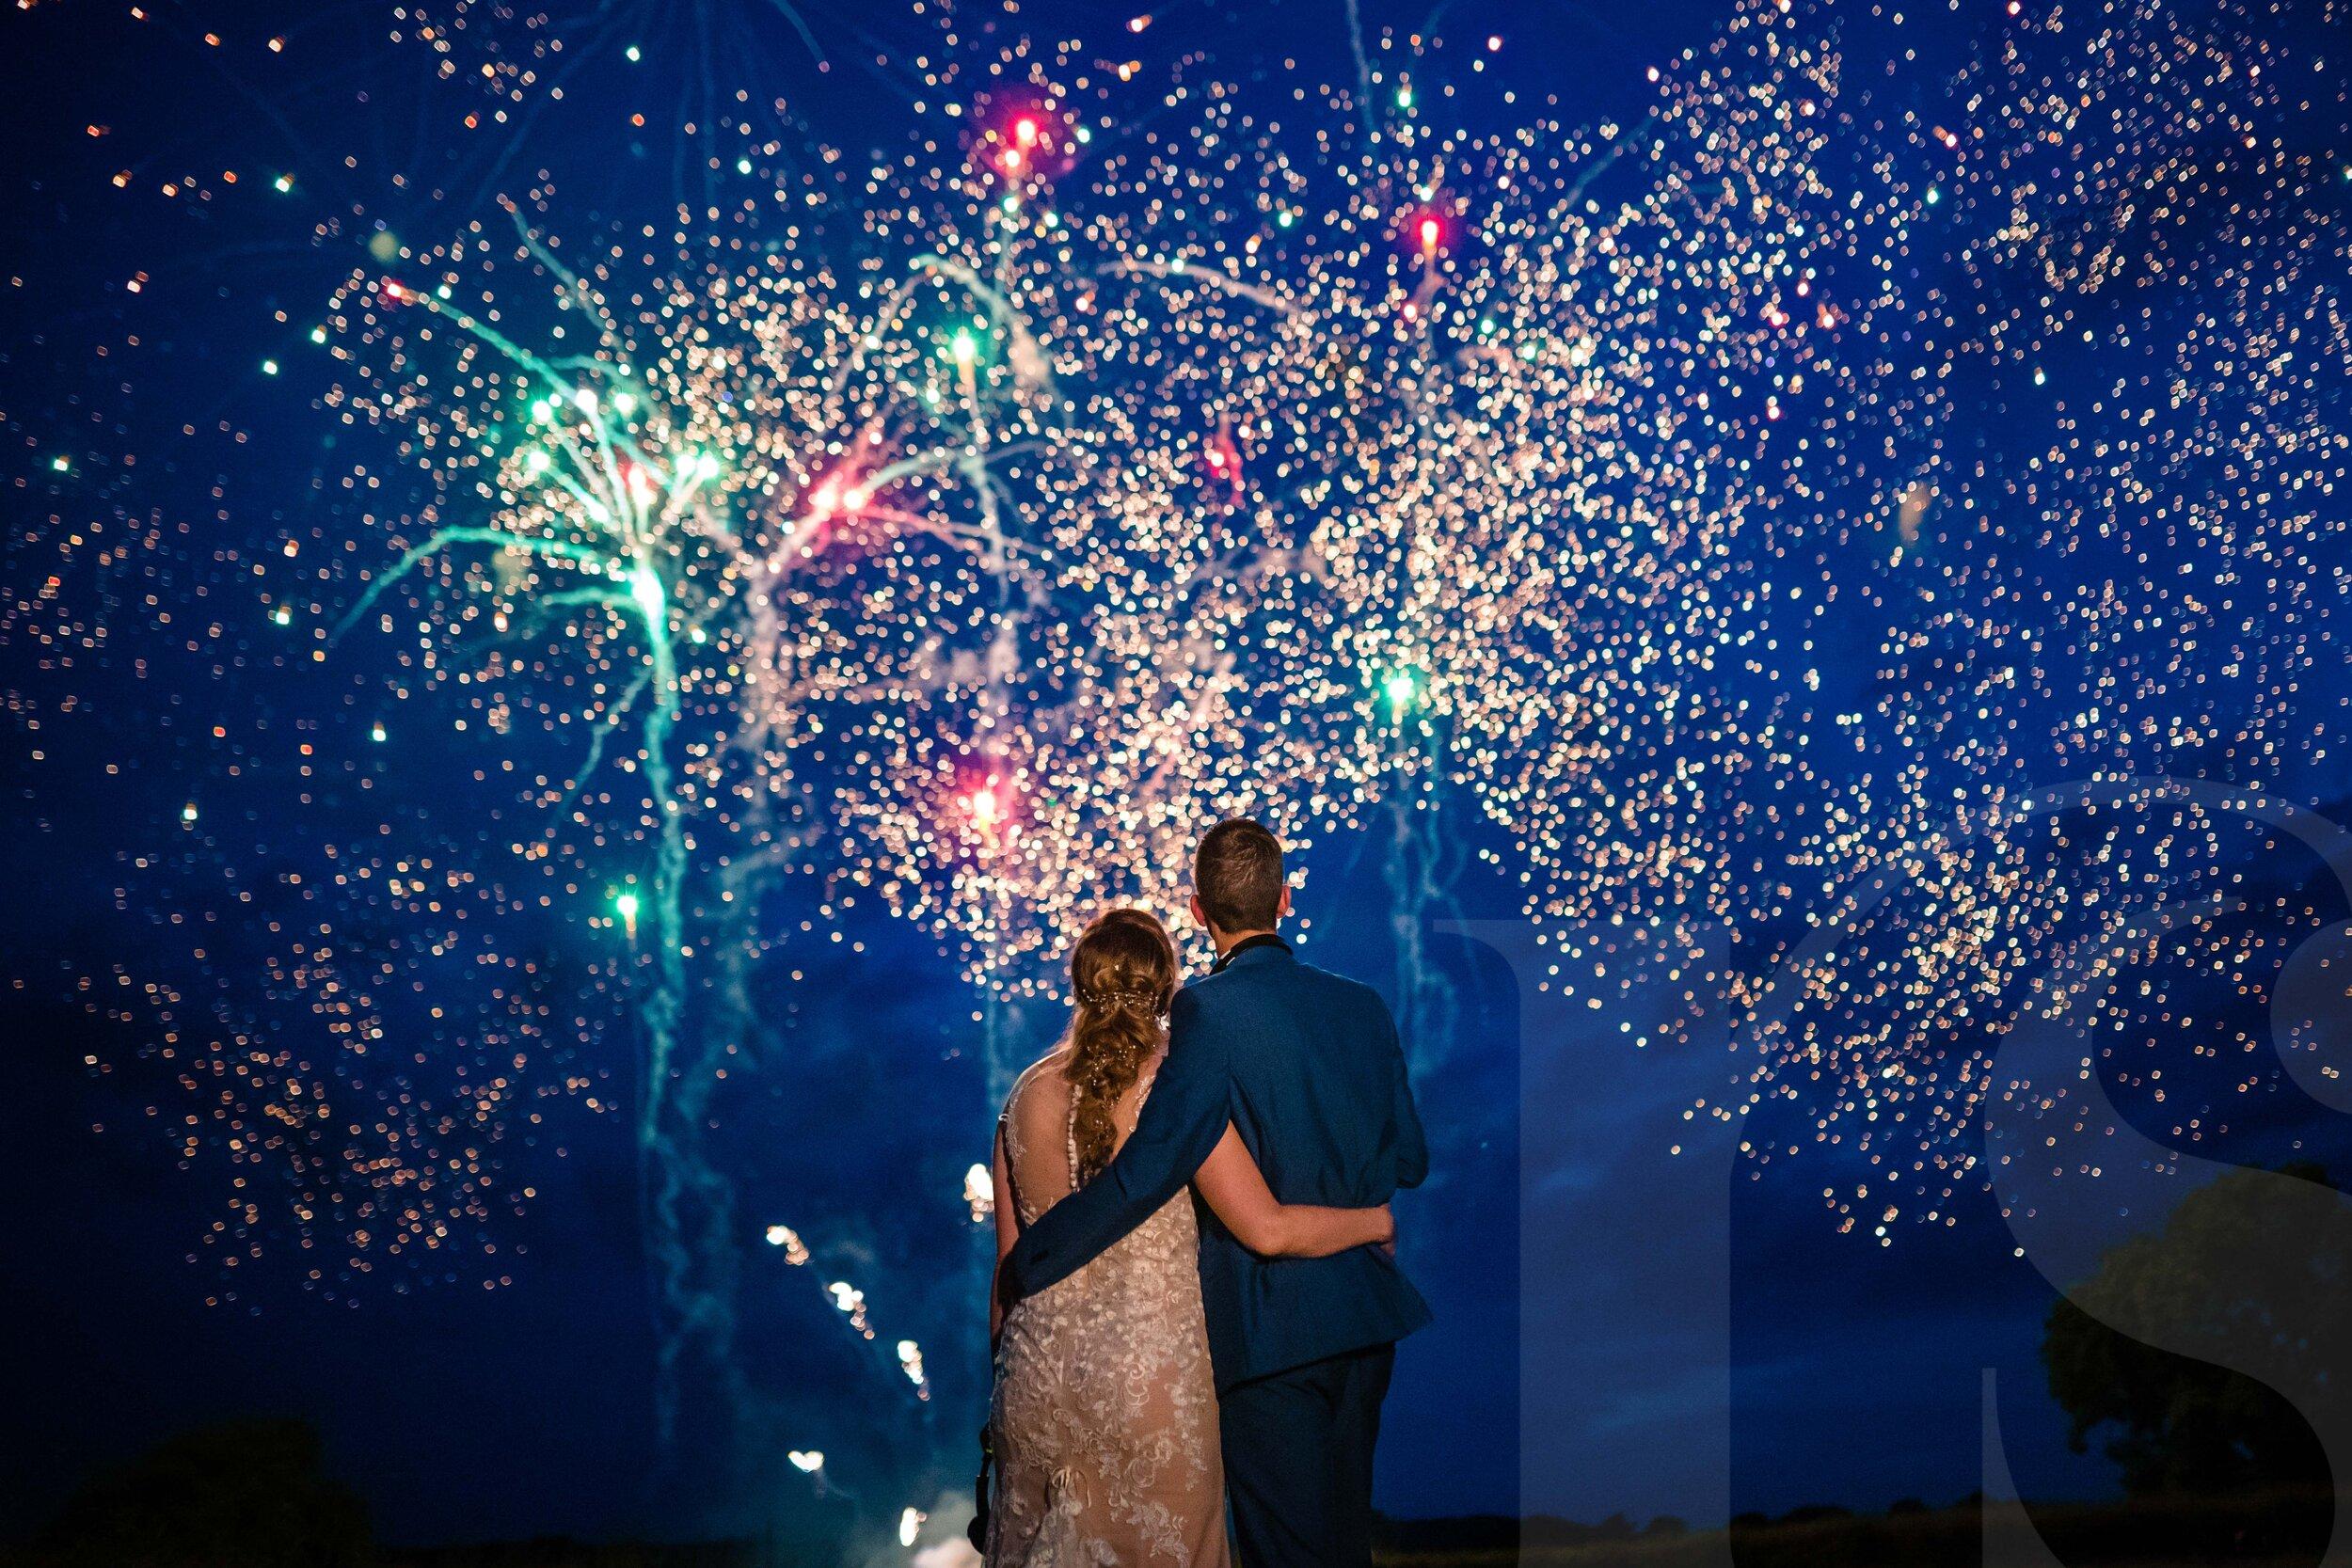 wedding-fireworks-photography-1.jpg